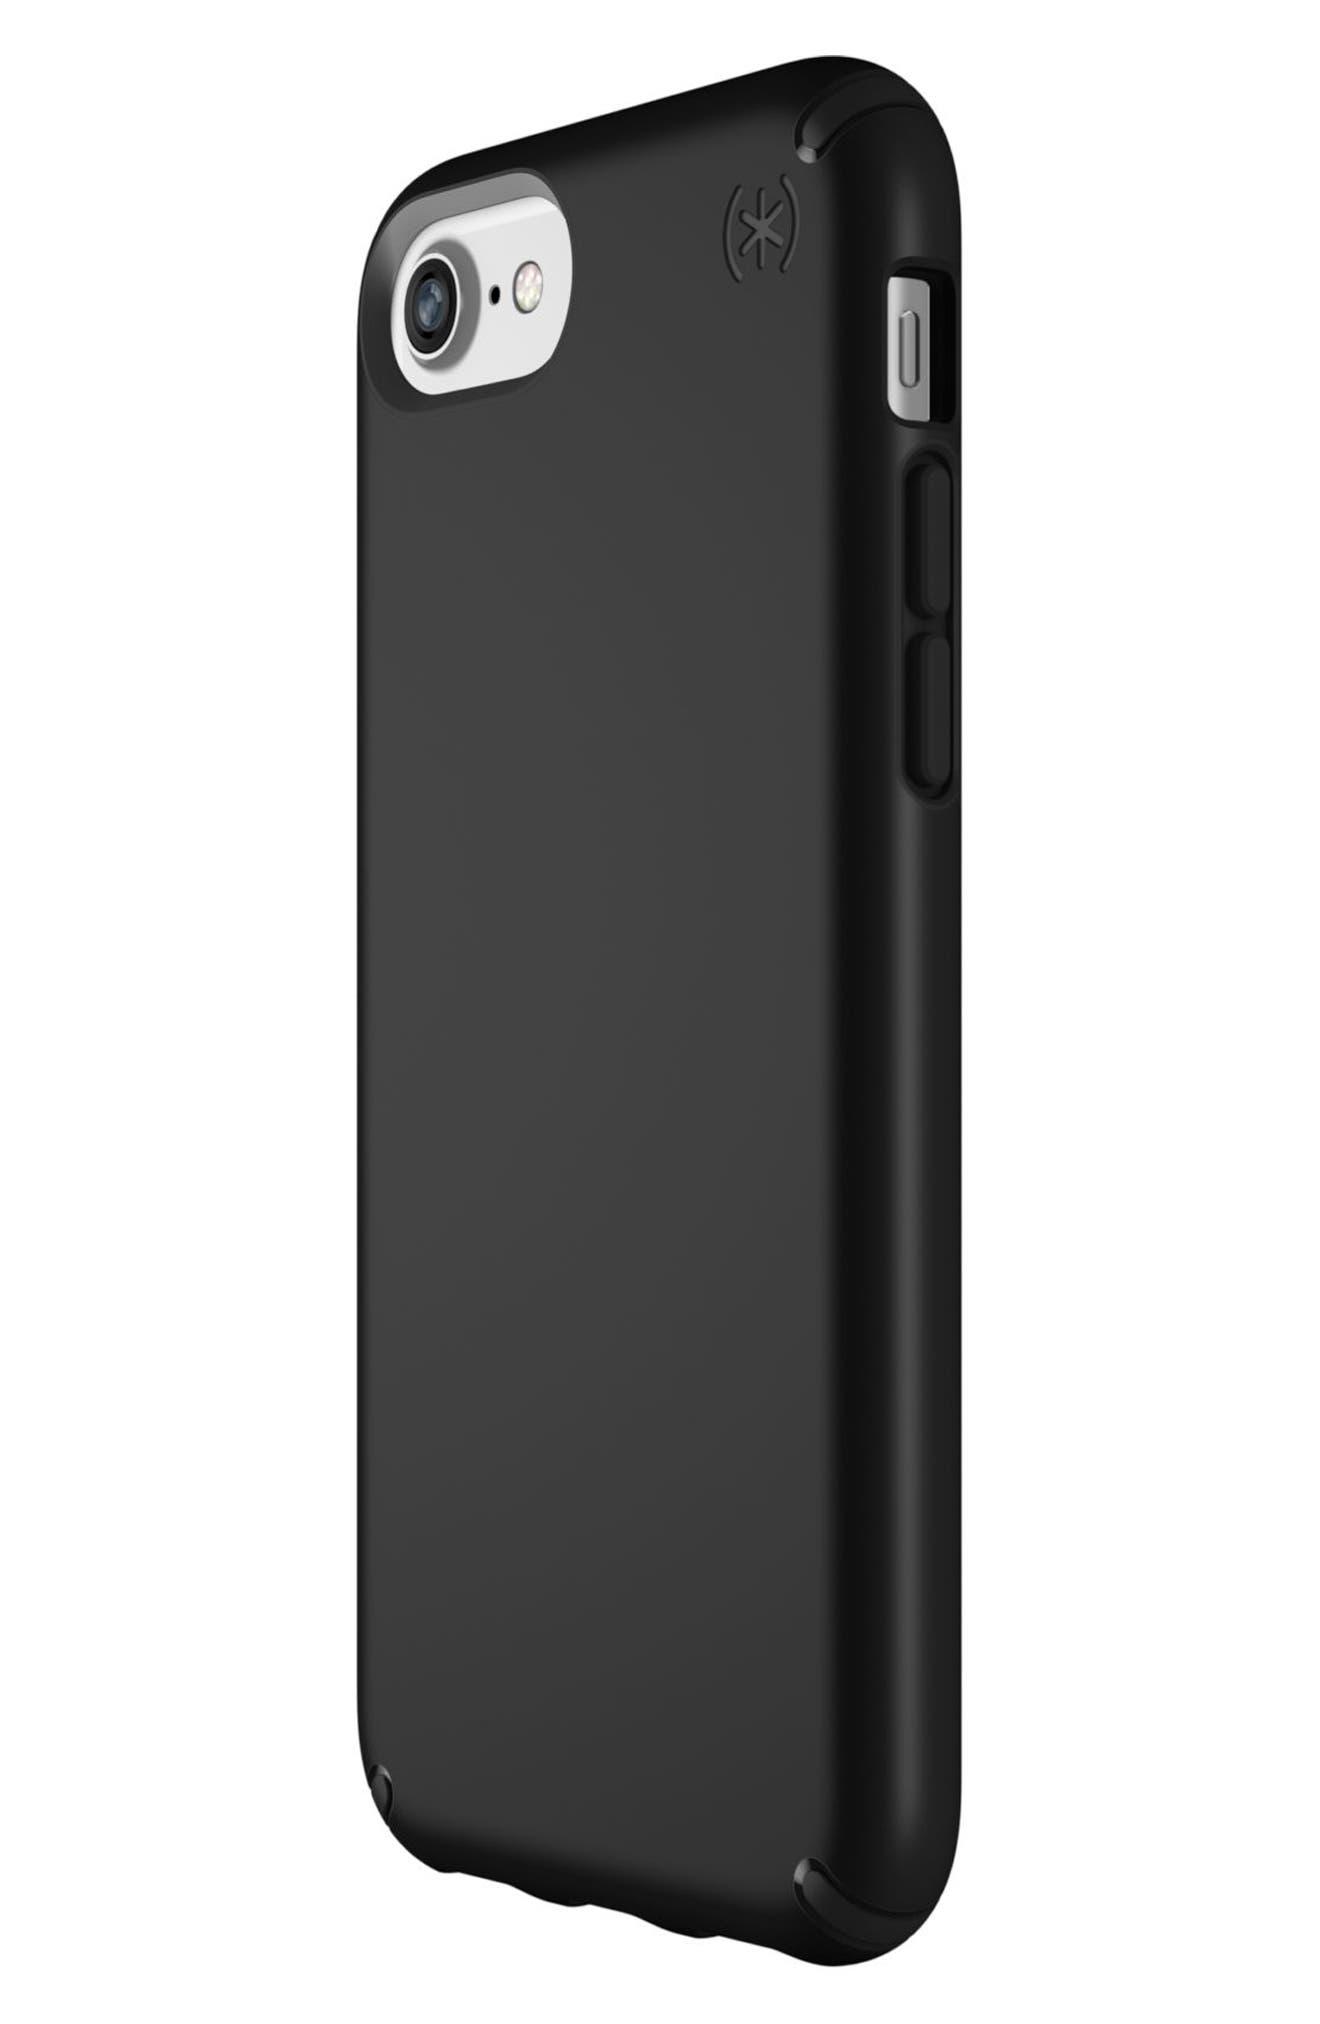 iPhone 6/6s/7/8 Case,                             Alternate thumbnail 3, color,                             Black/ Black